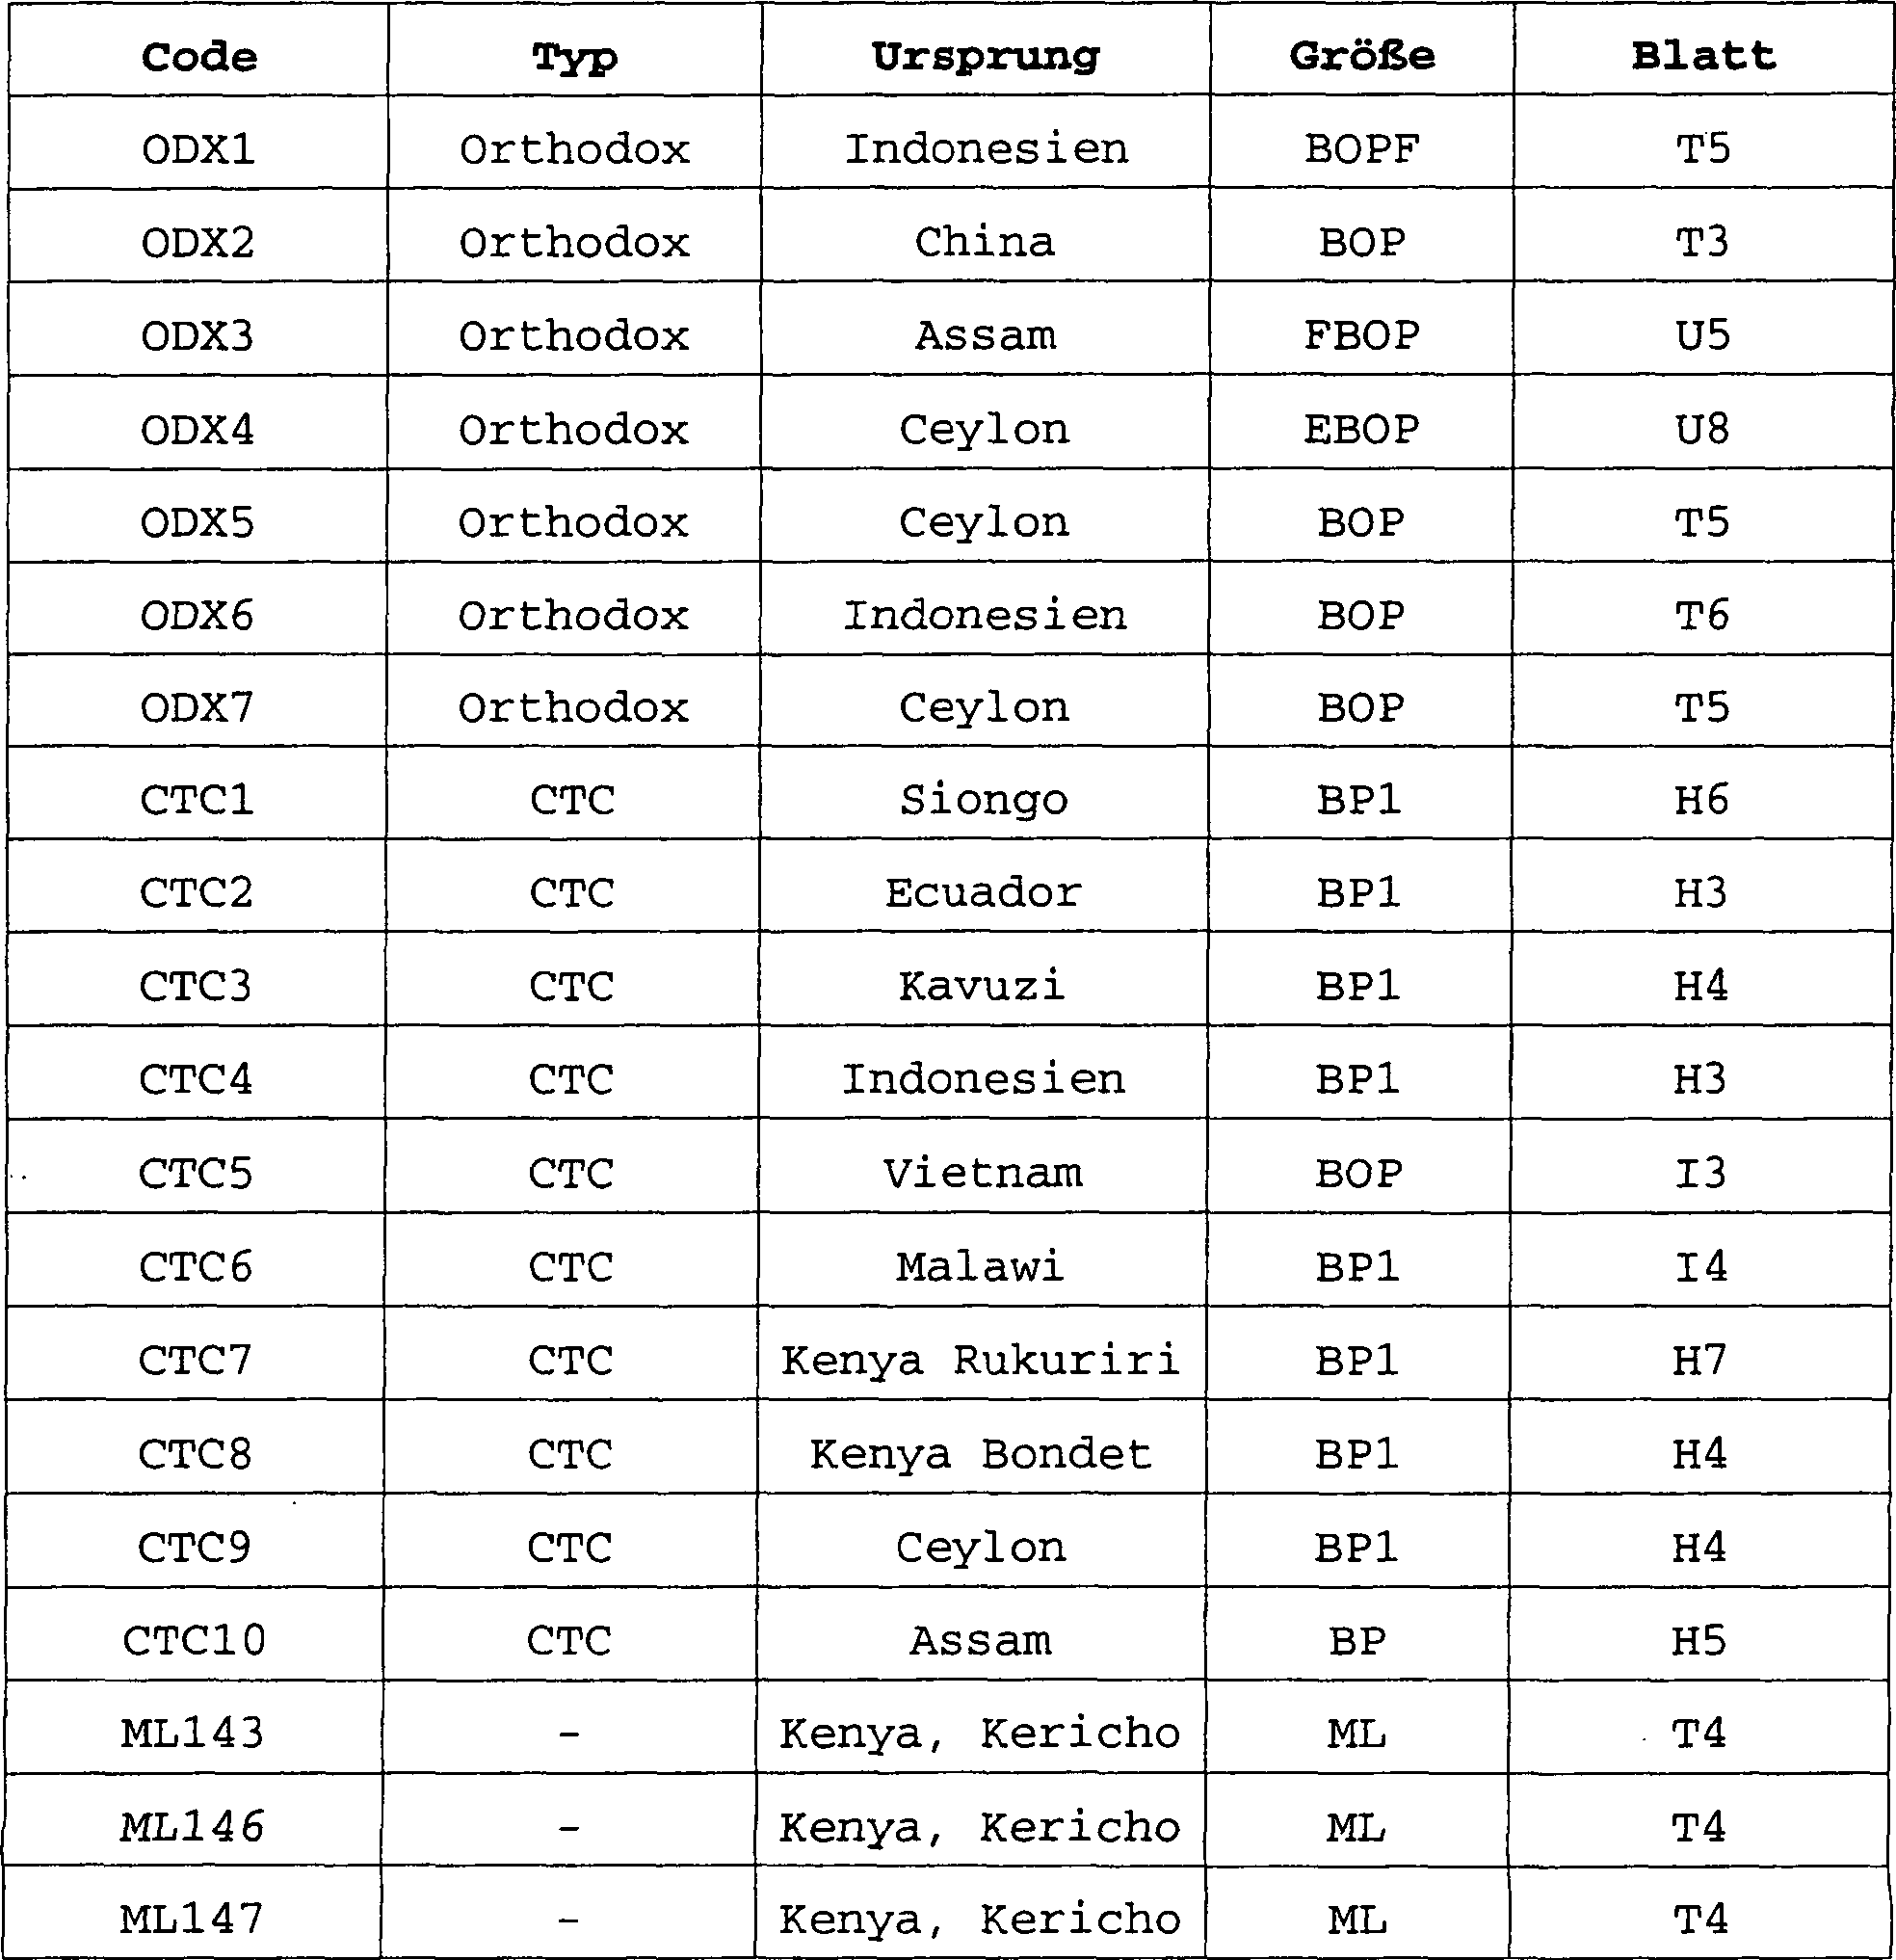 DE60018287T2 - tea product - Google Patents